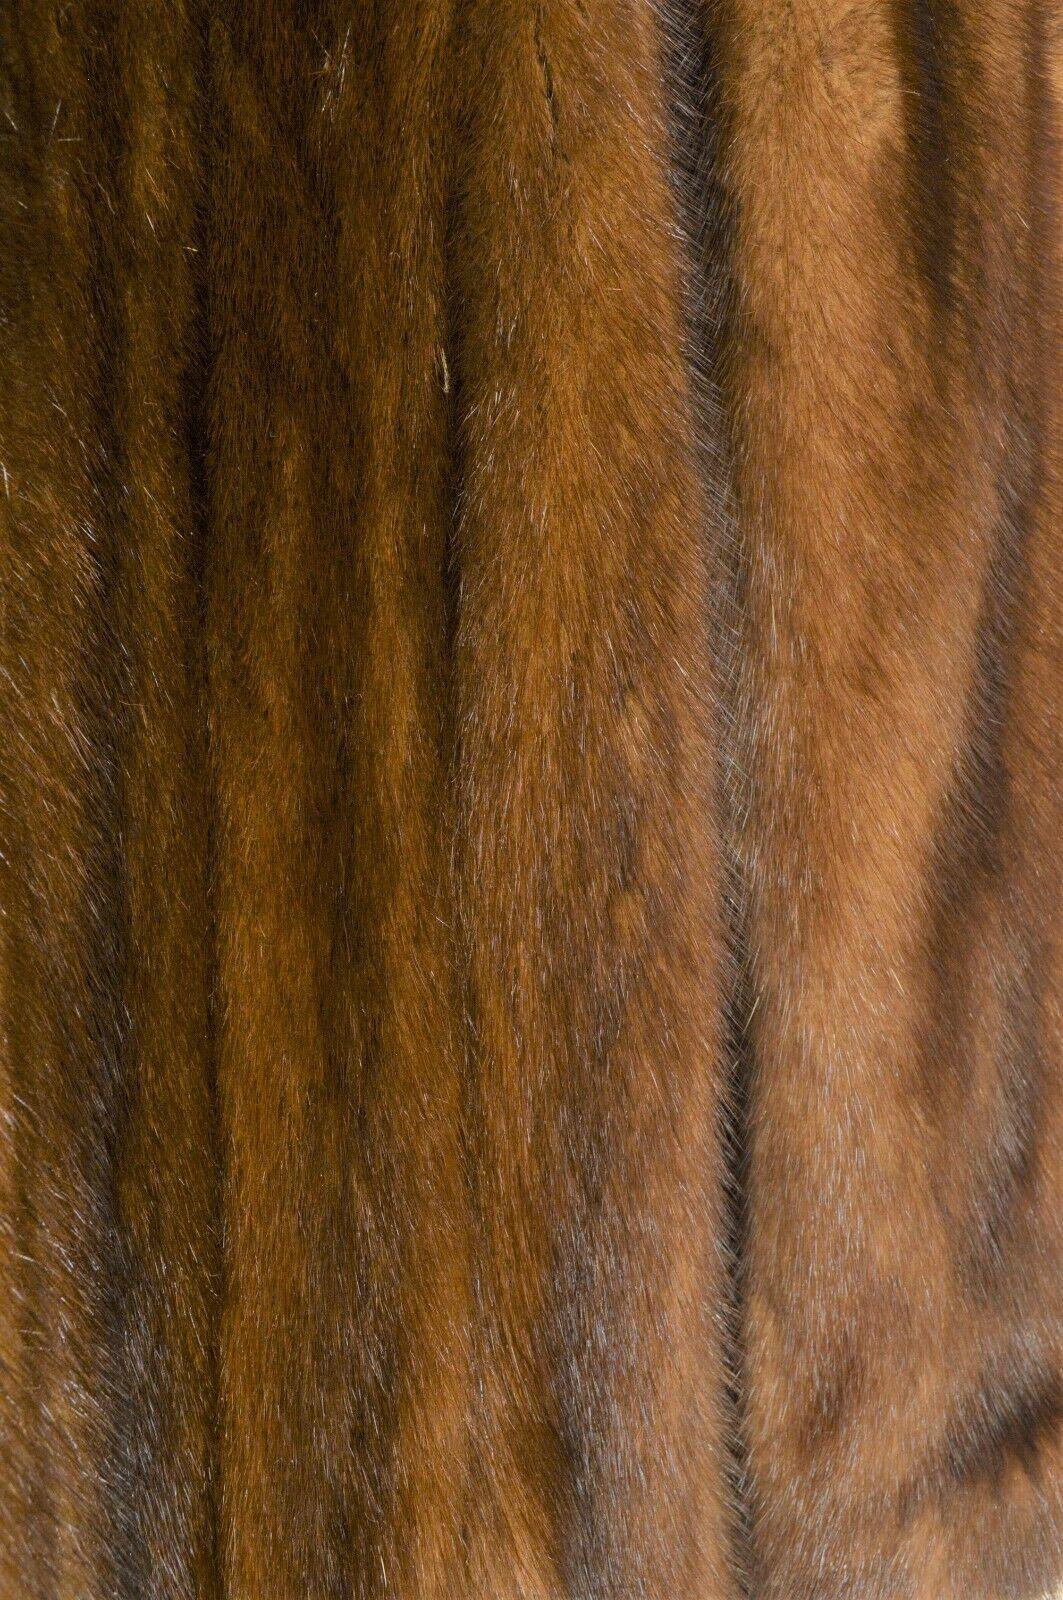 France Olivia mink fur coat FR 44 full length mahogany chic sophisticate brown image 11